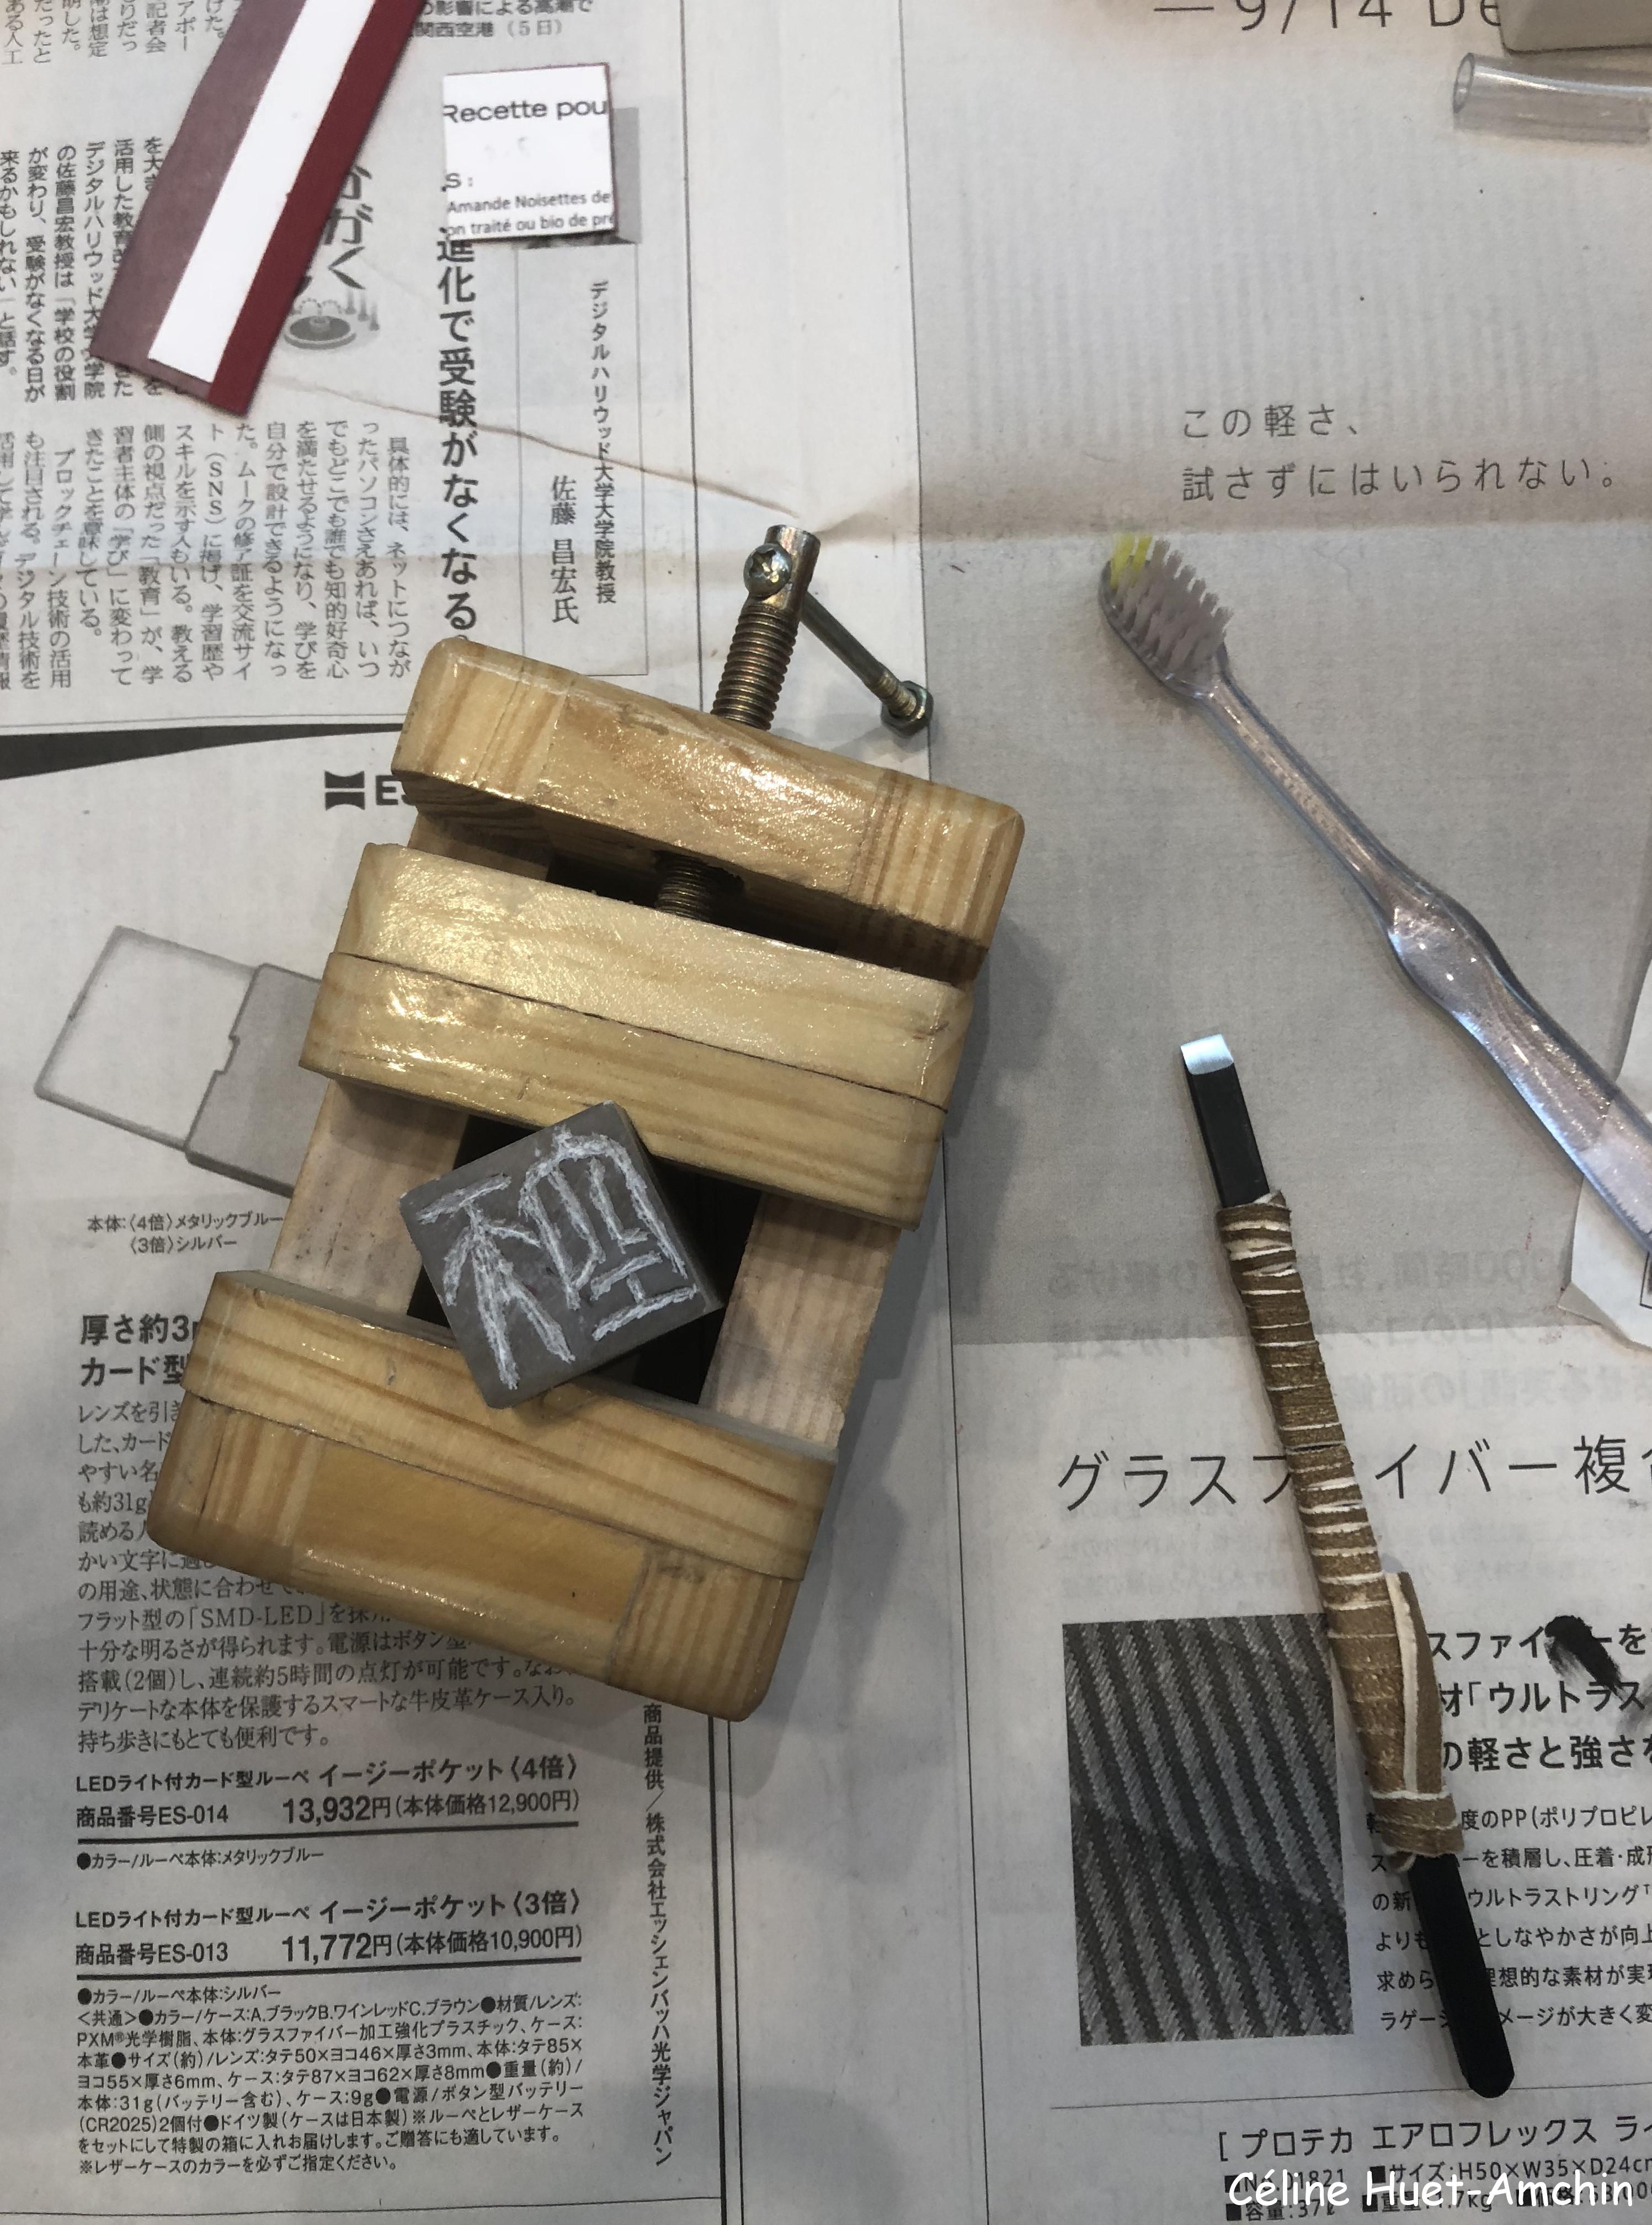 Atelier Tenkoku Librairie Junku Paris